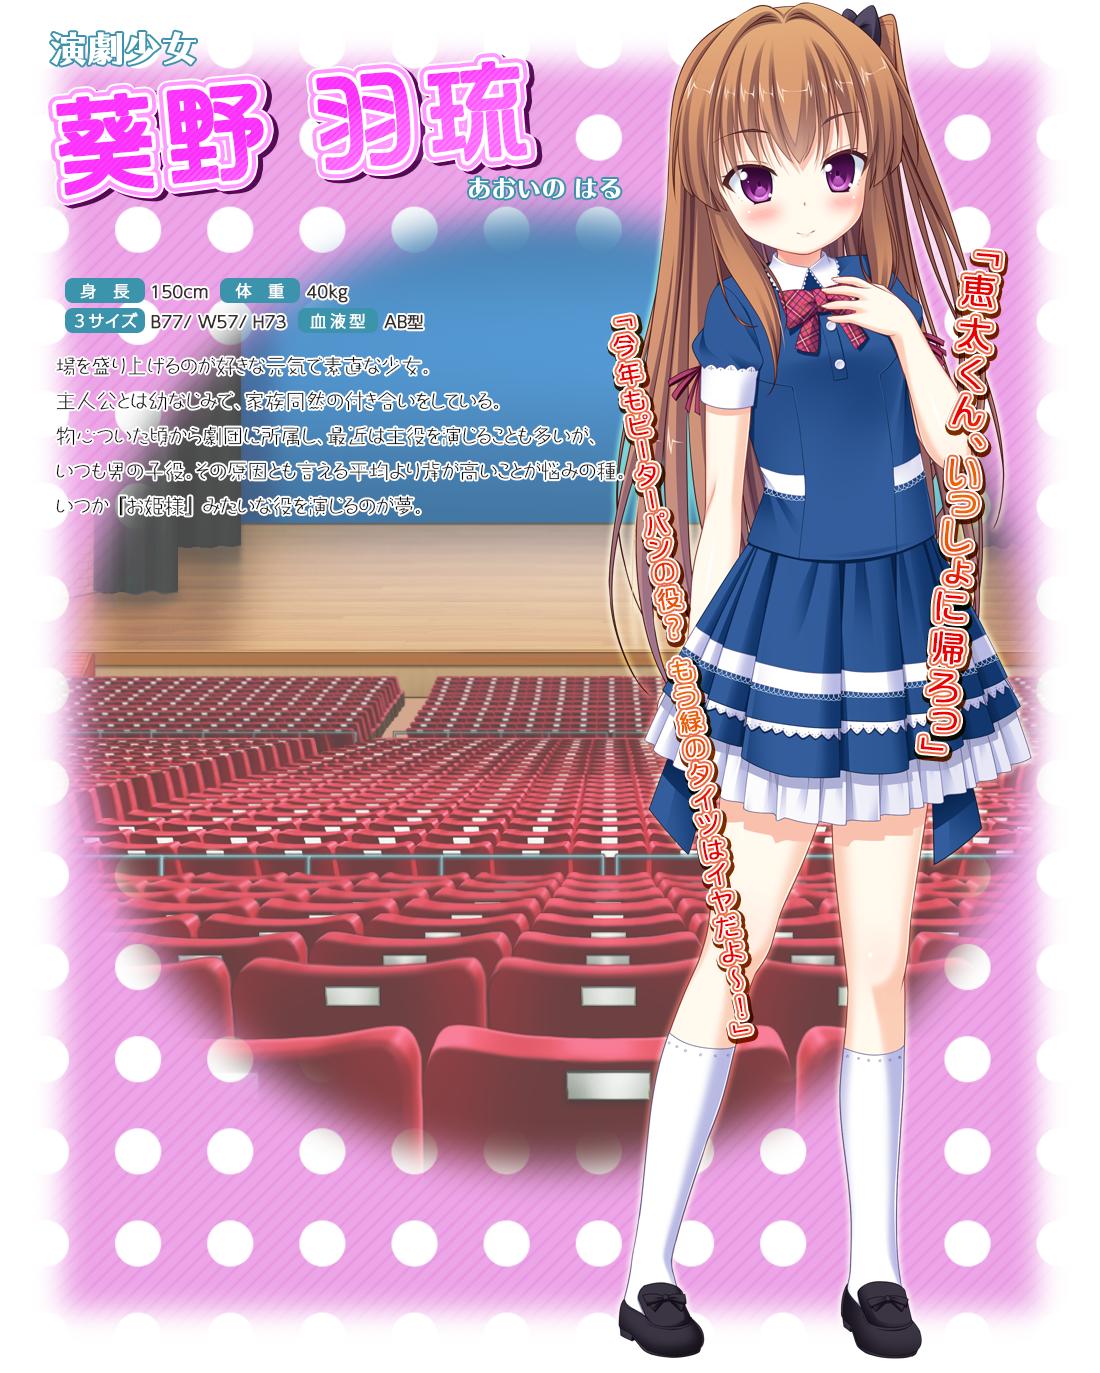 character_back_haru.png